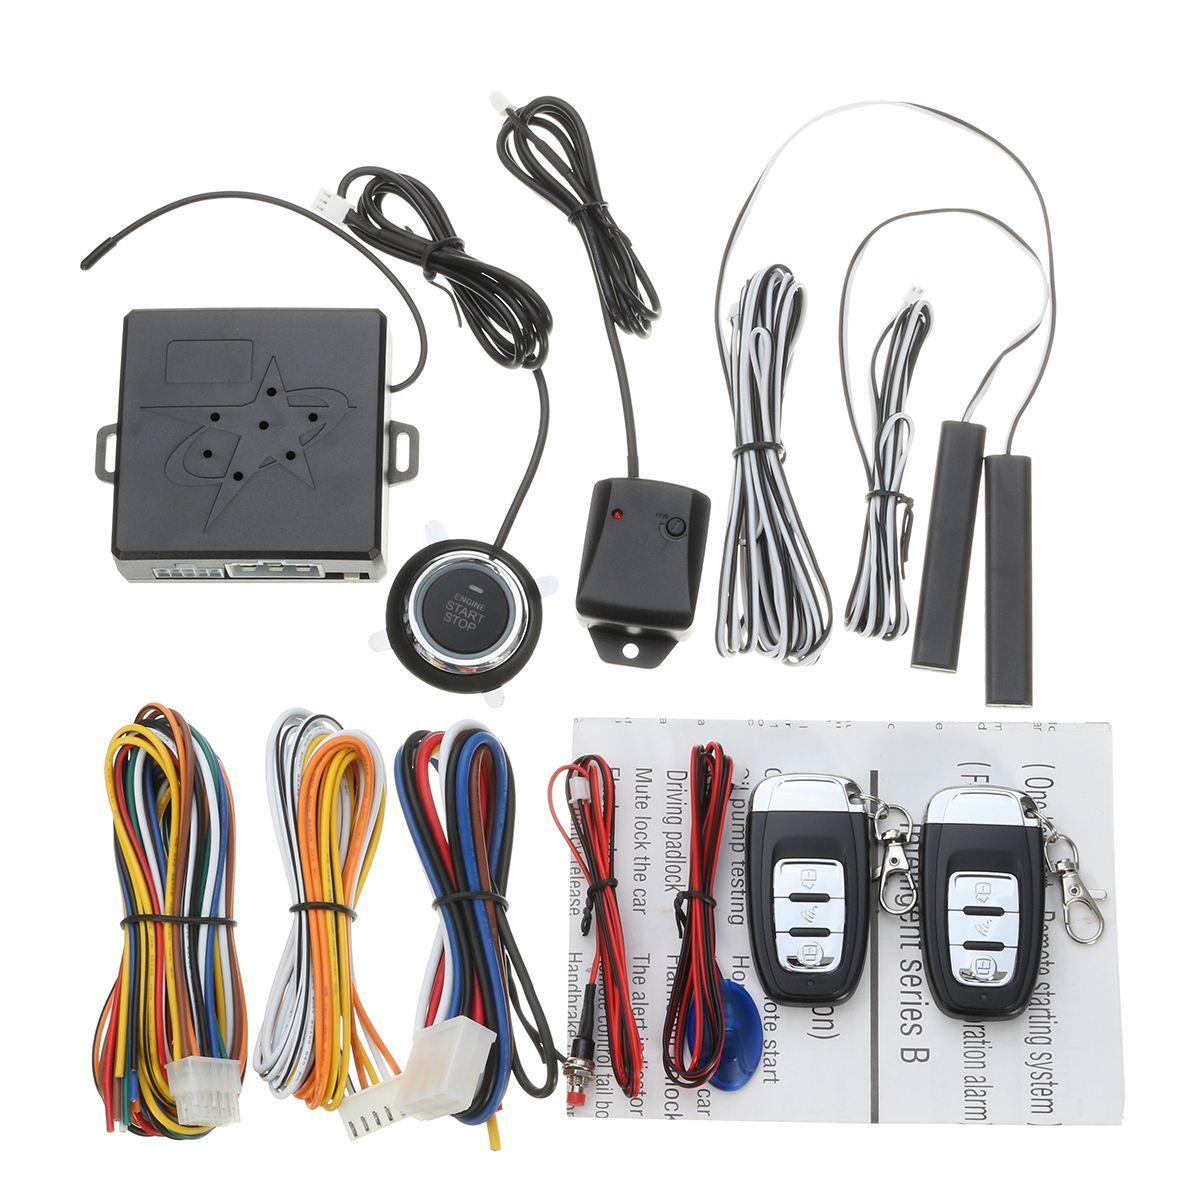 1 Set Universal Car RFID Immobilizer Car Alarm Start Security System Keyless Start Push Button